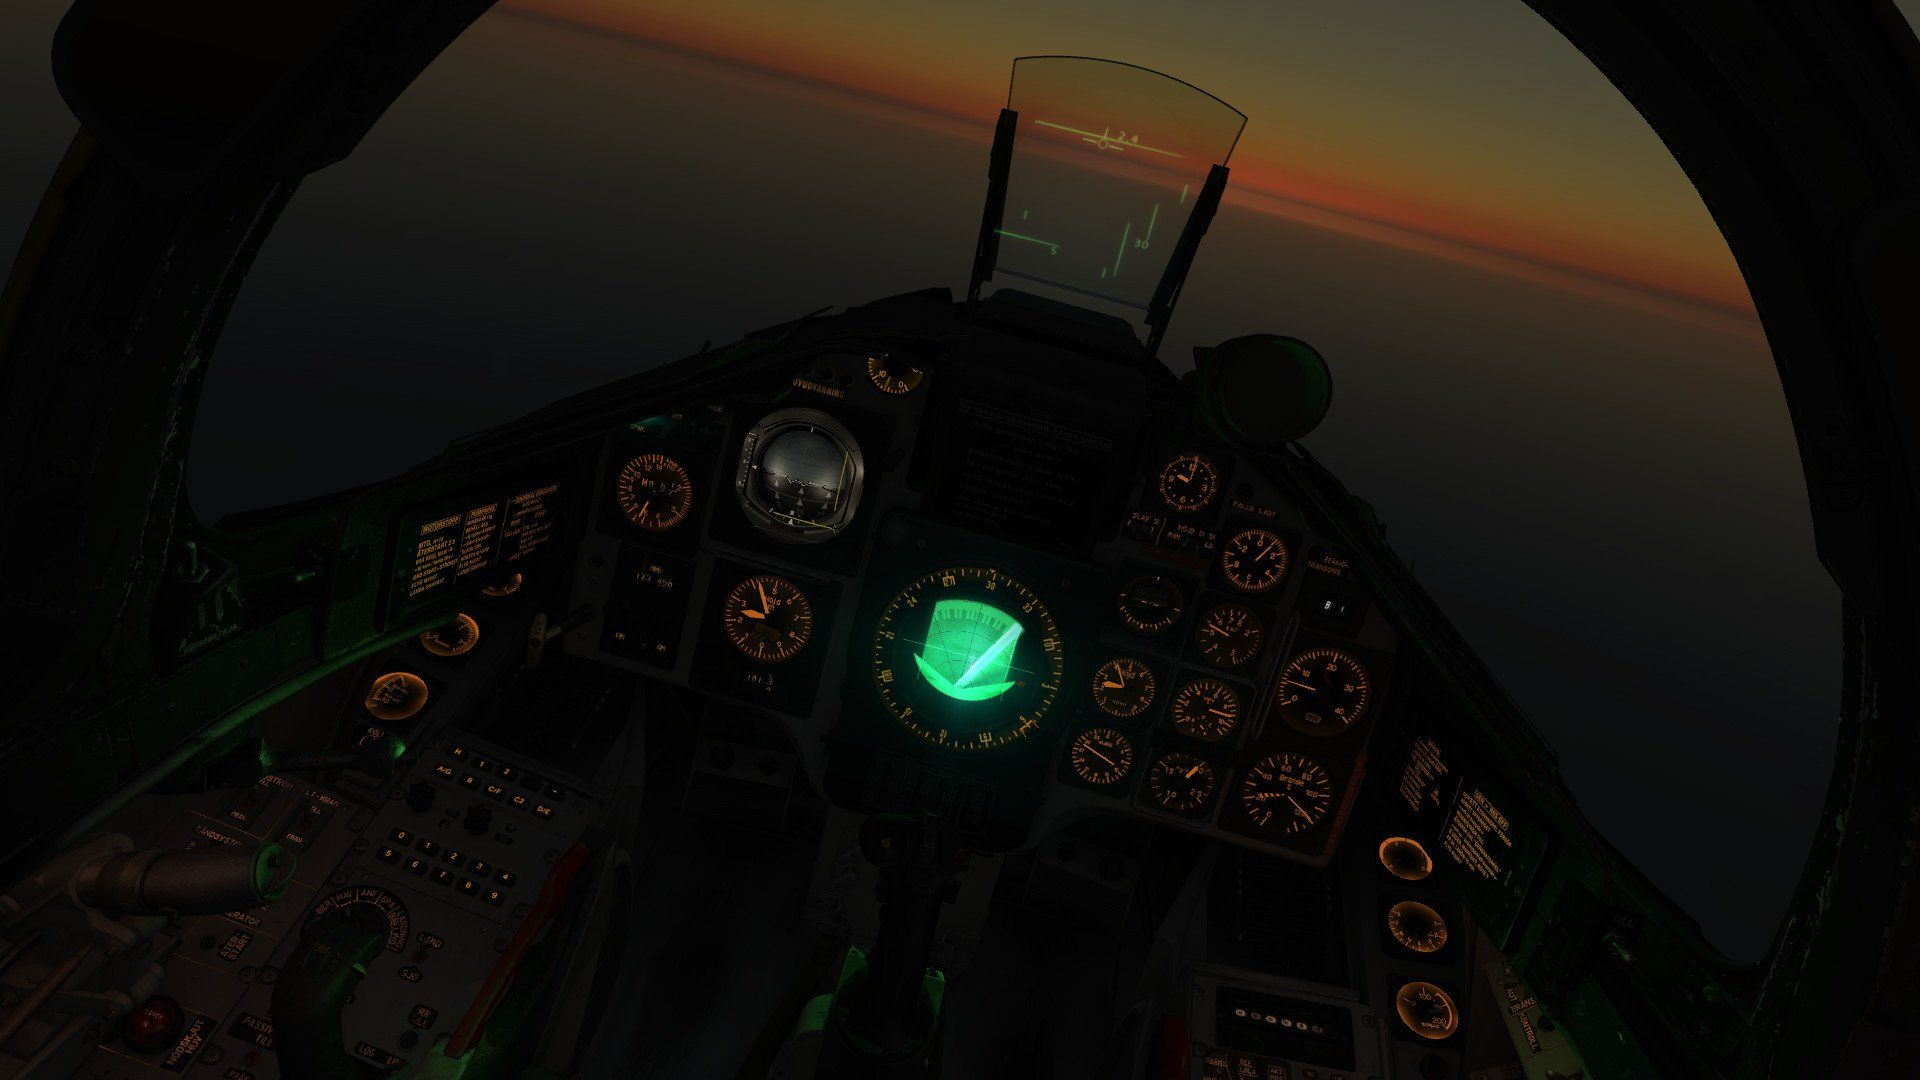 Pin By Adam Crockett On Cockpit 3d Models Spaceship Sci Fi